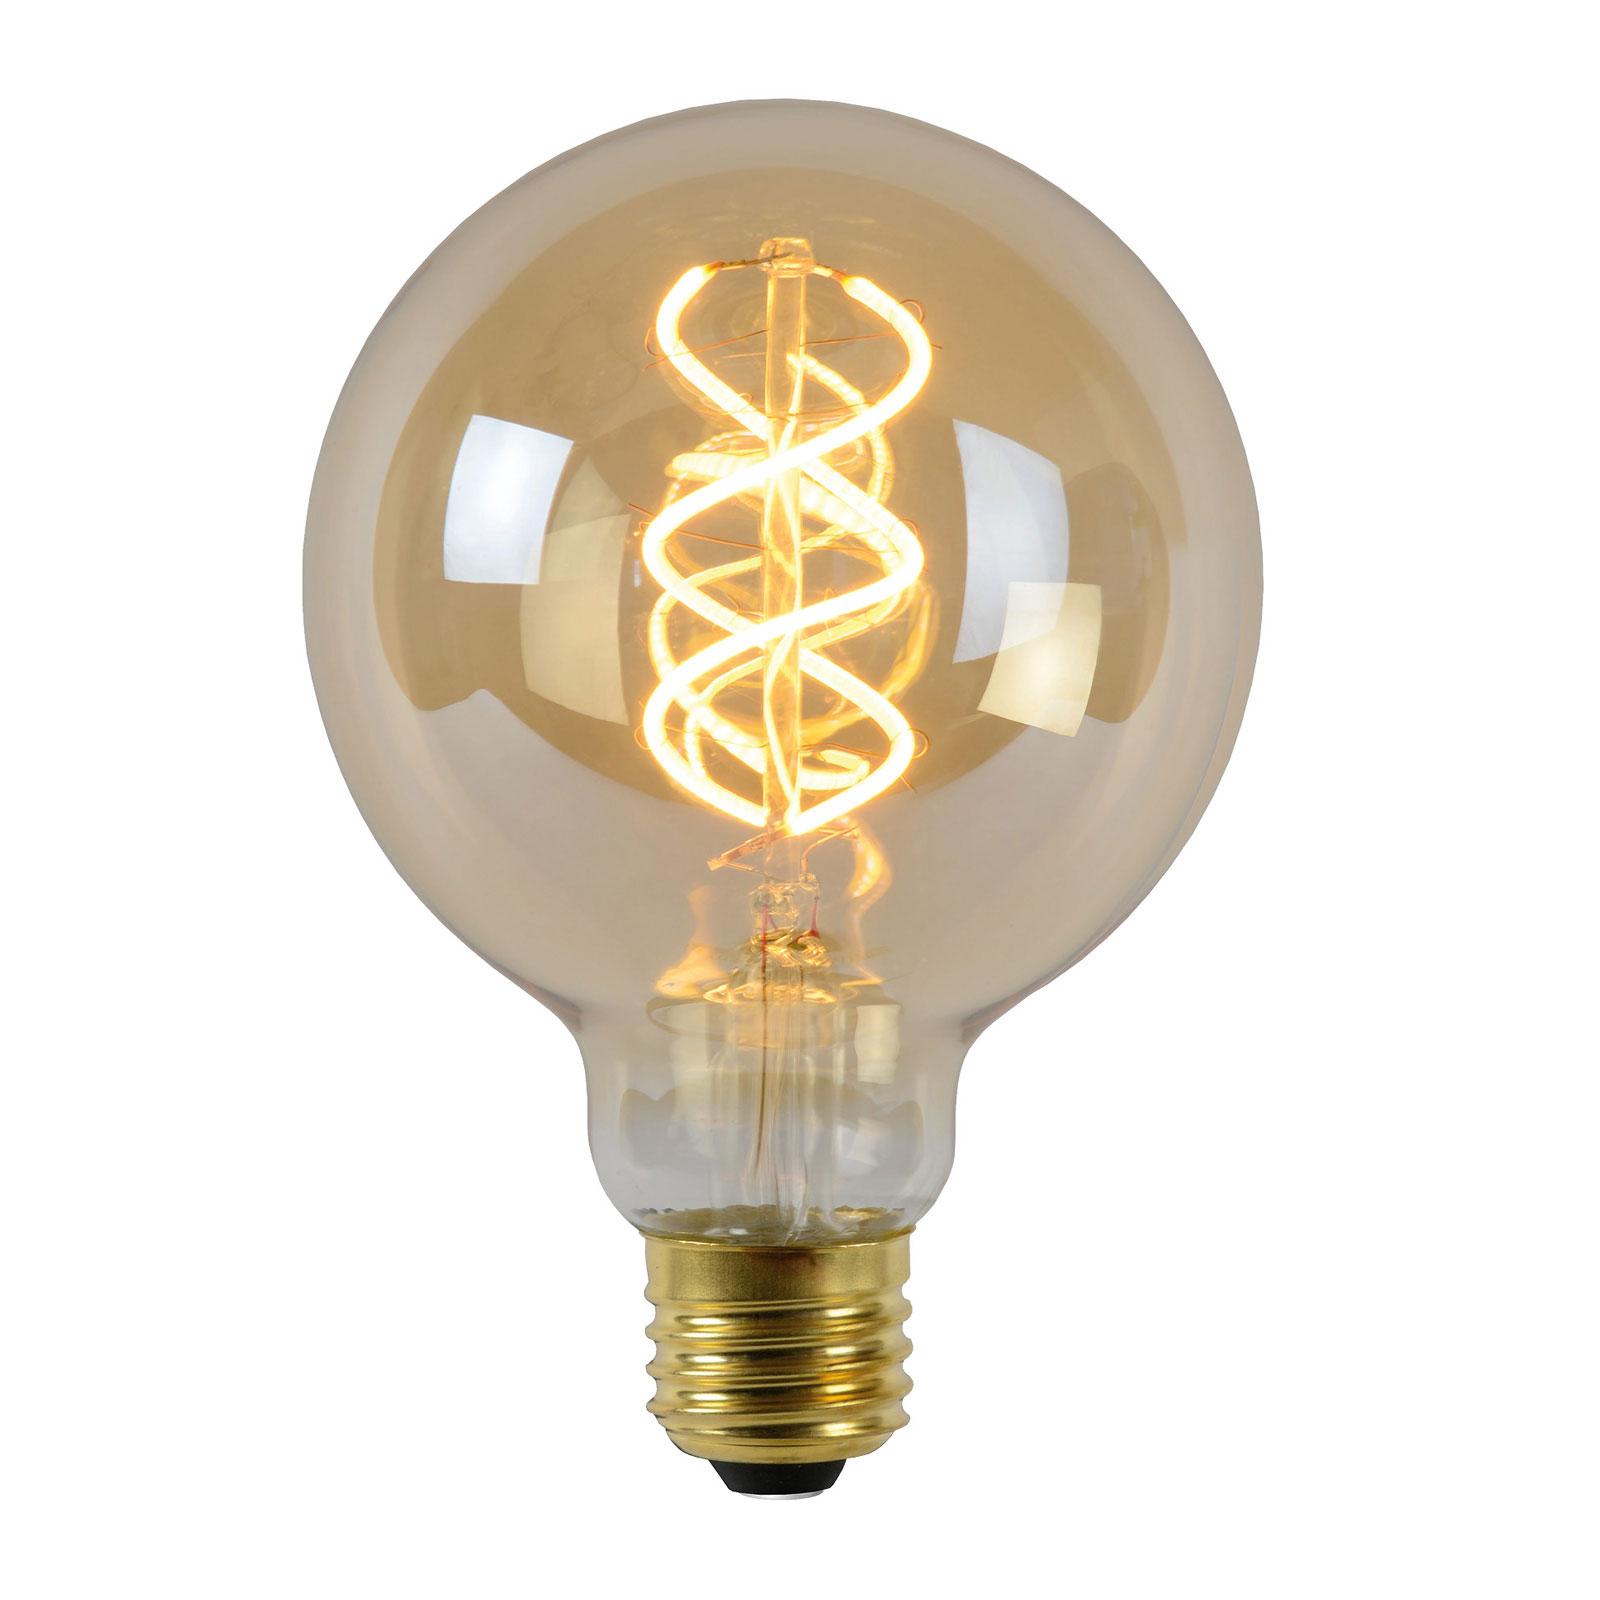 LED-lamppu E27 Globe 4W 2 200 K amber tunnistin